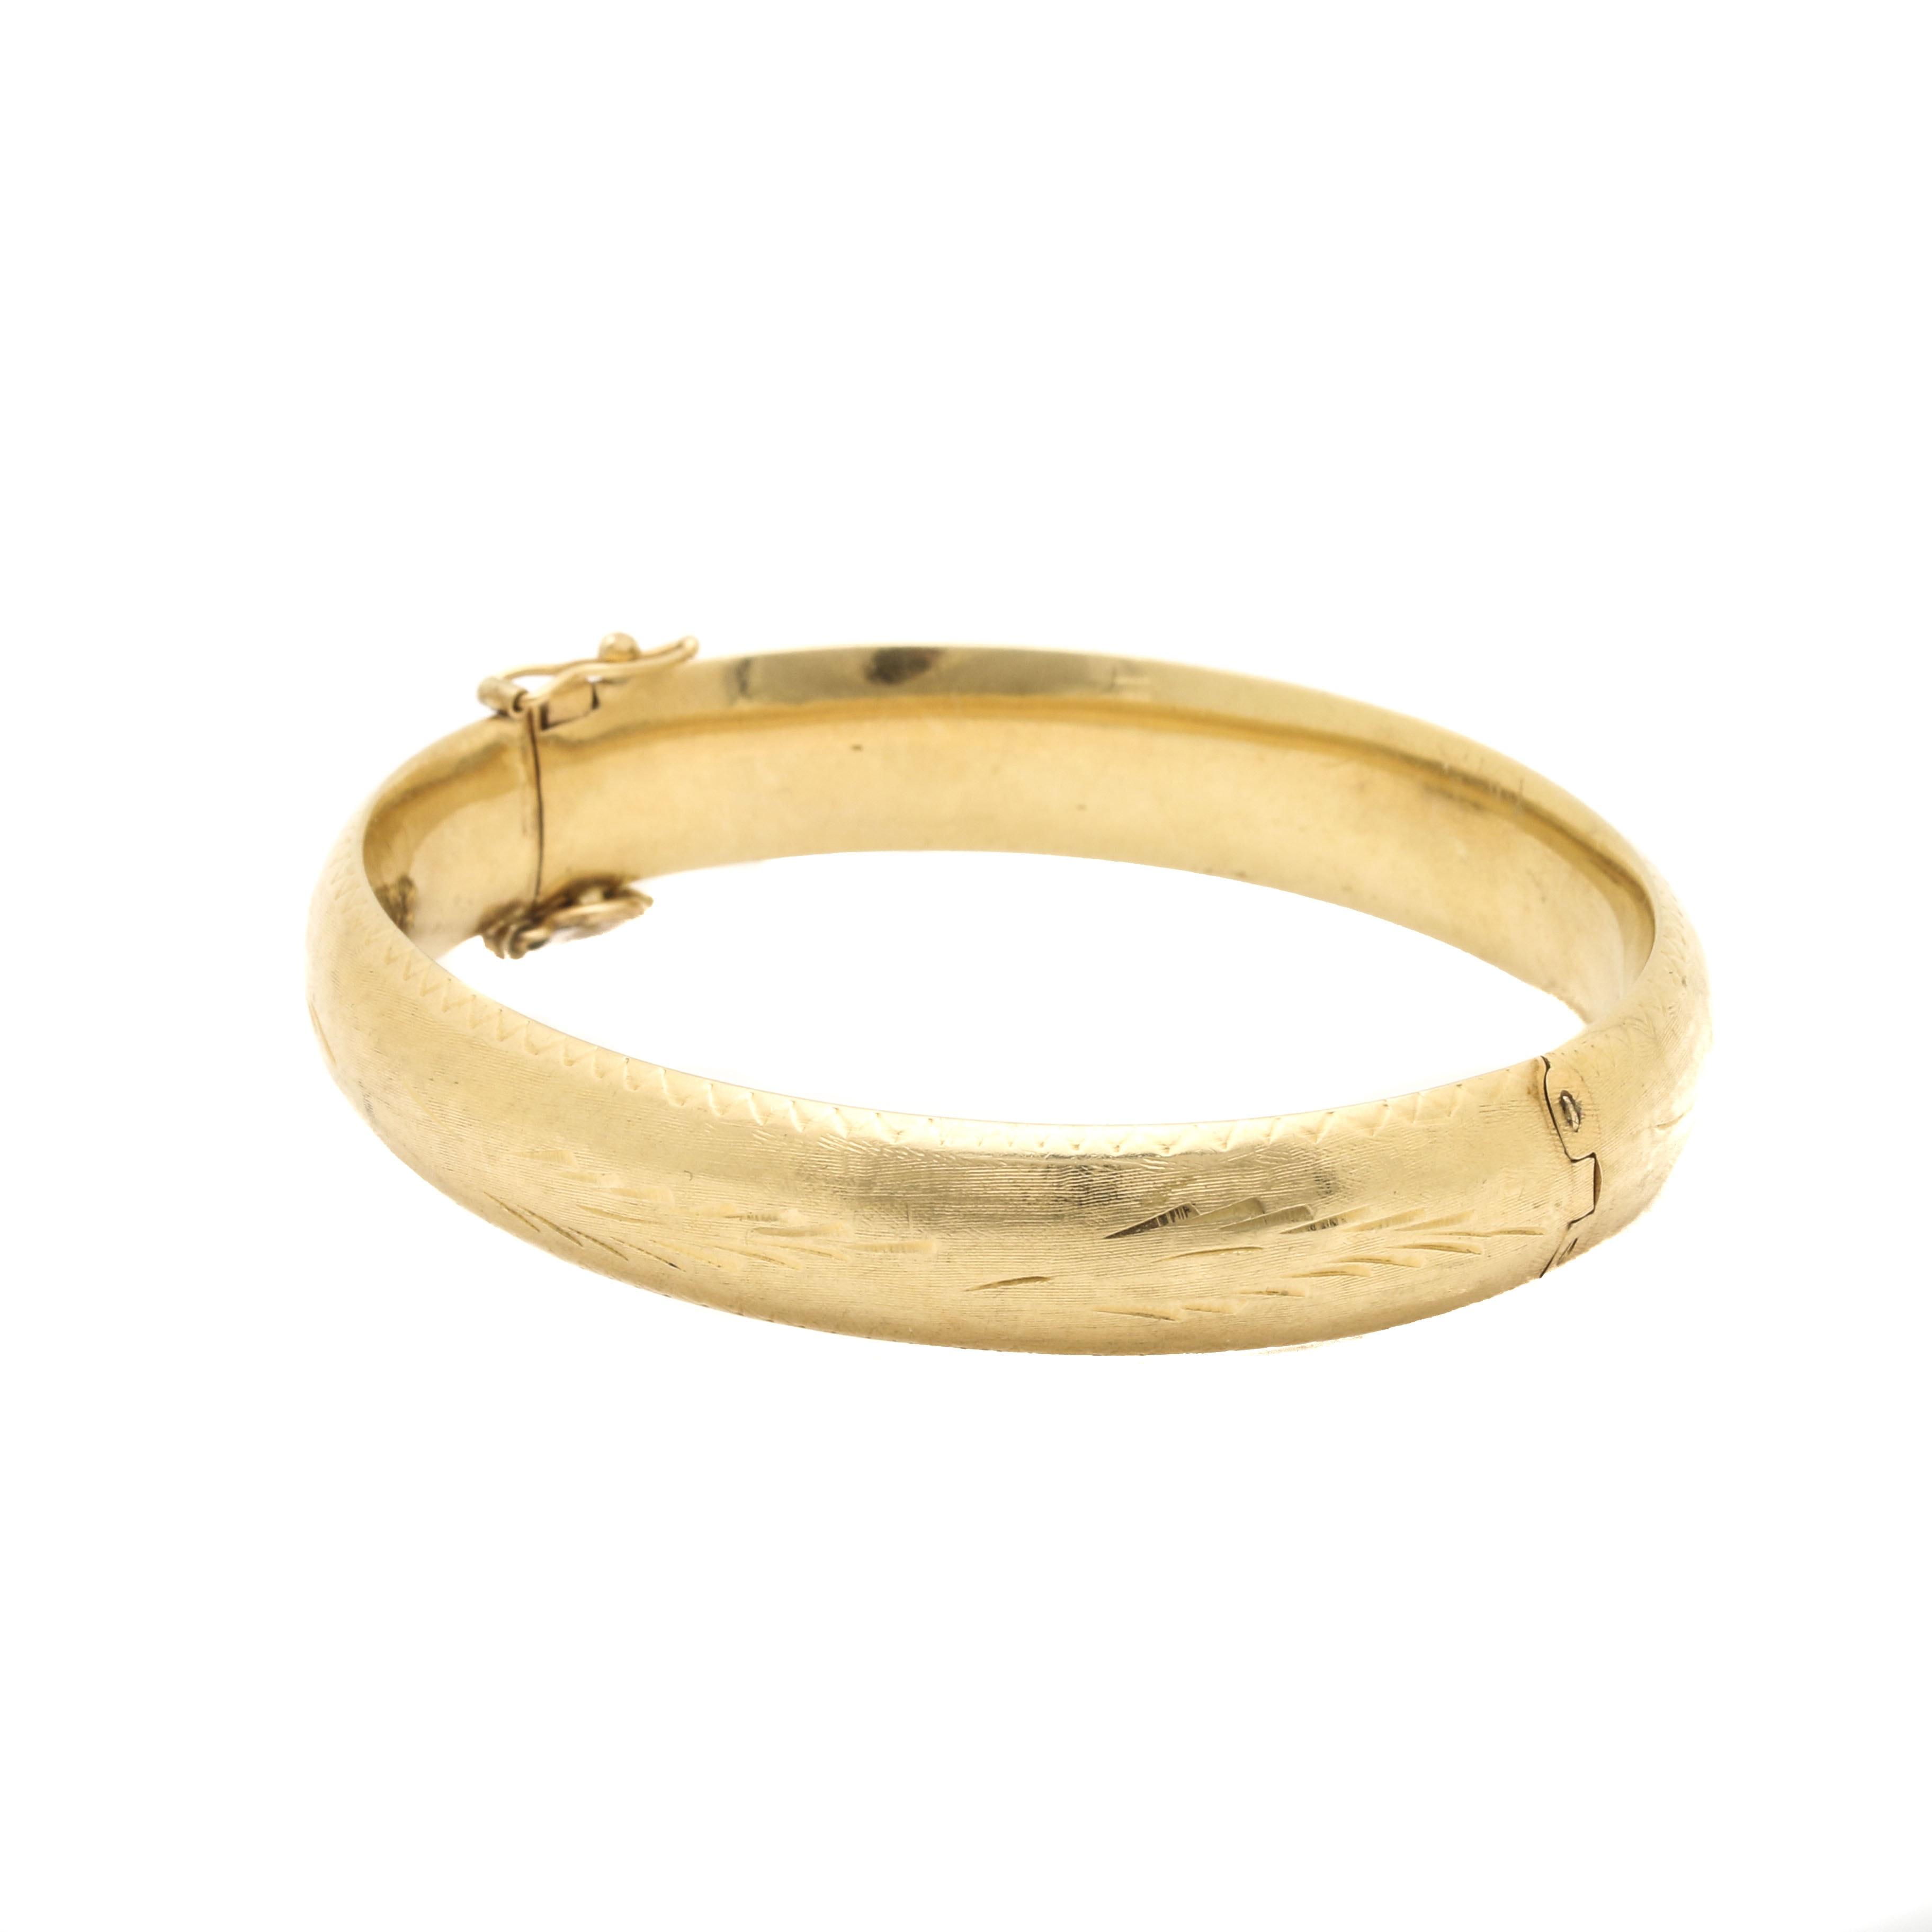 14K Yellow Gold Textured Hinged Bangle